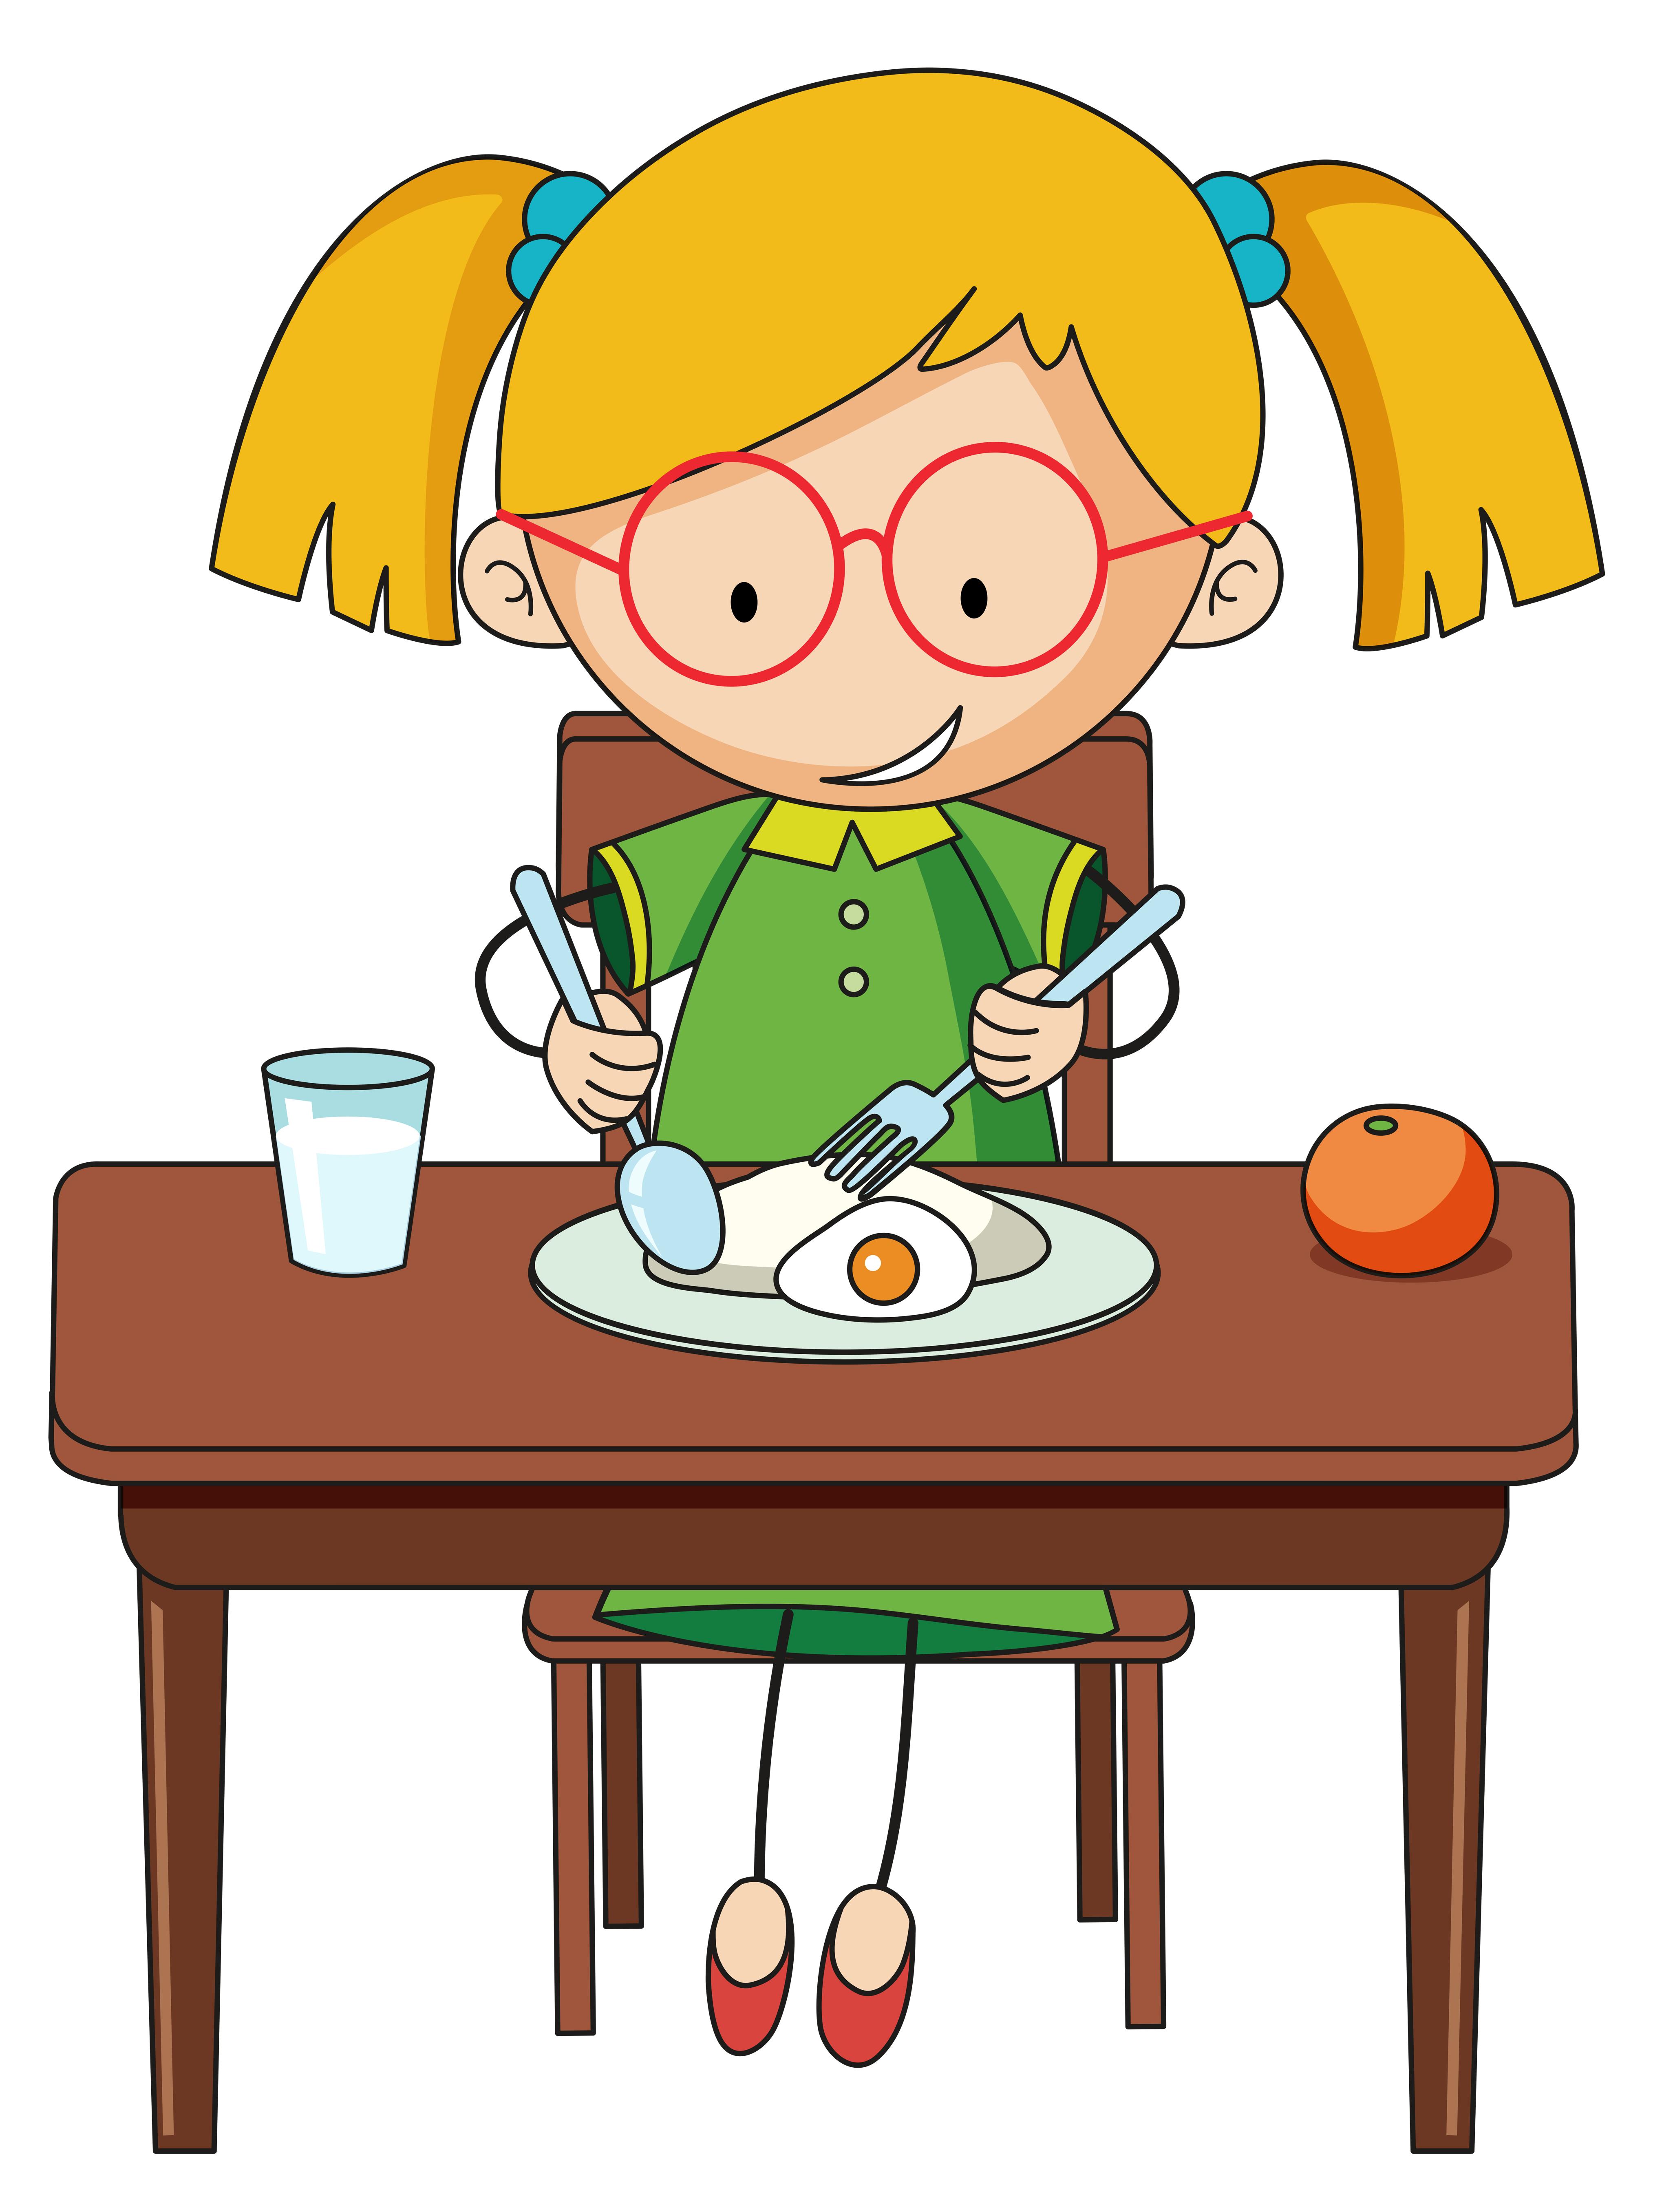 Doodle girl charcter eating breakfast 519620 - Download ... (4055 x 5426 Pixel)